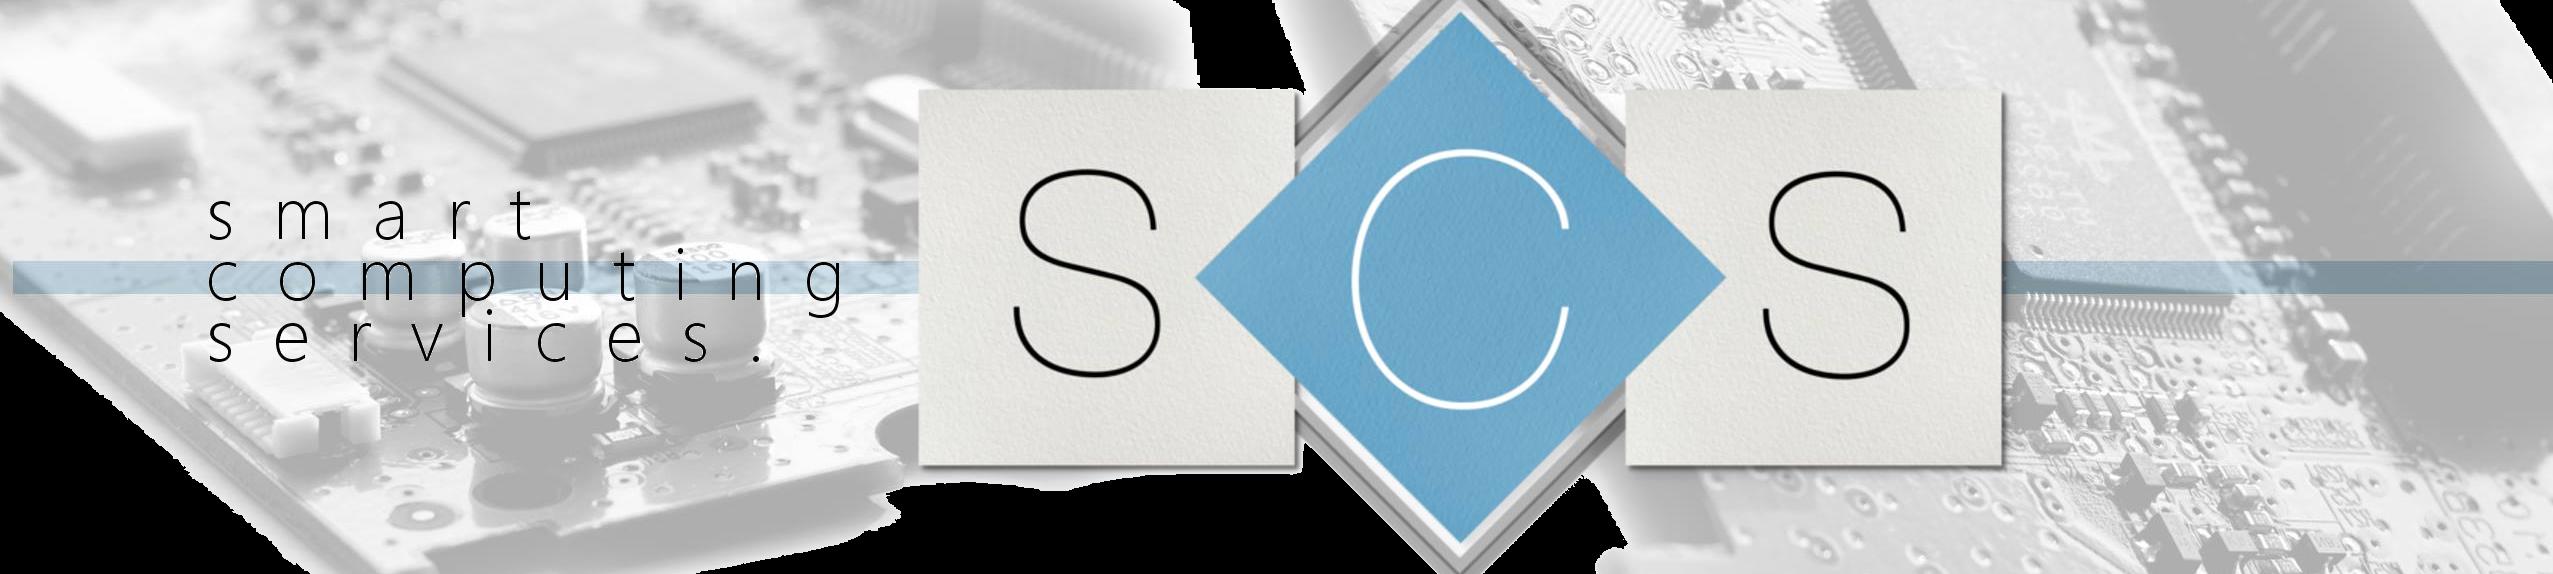 SCS : IT-Hilfe in und um Pegnitz